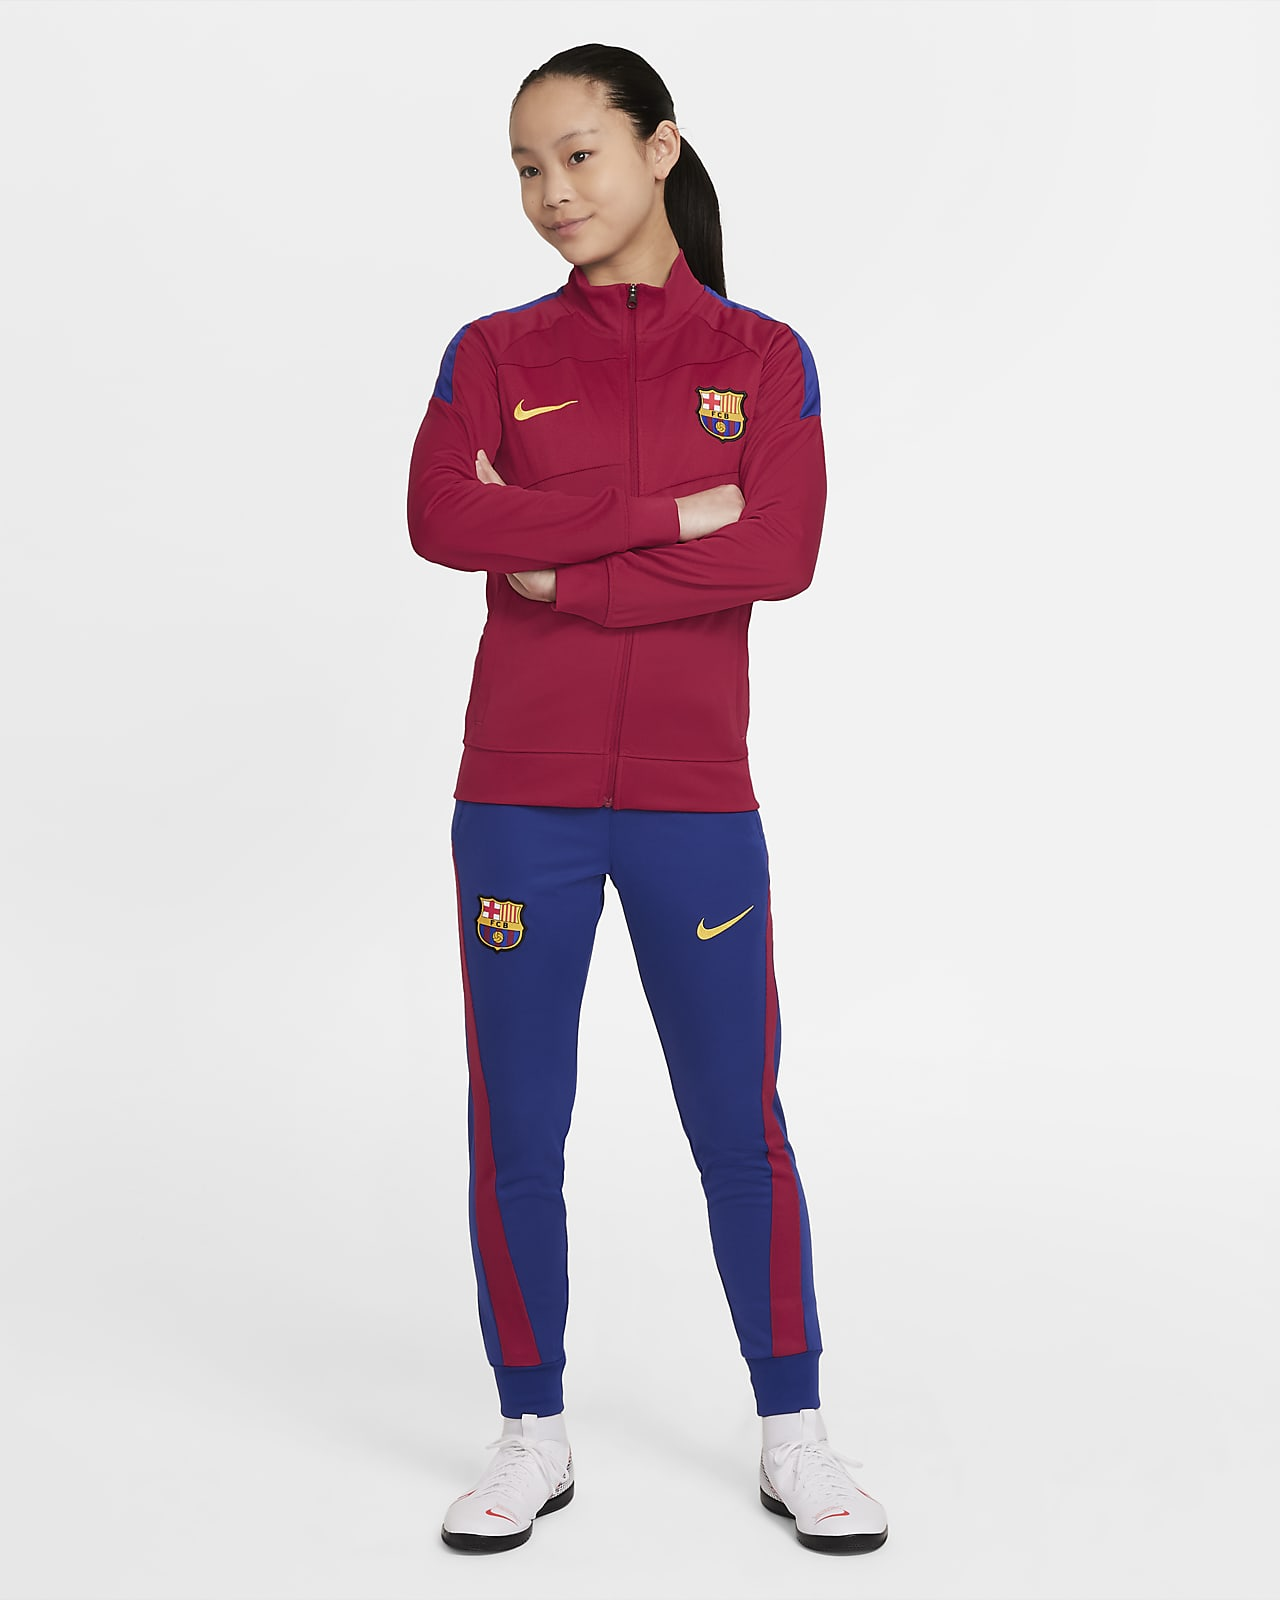 FC Barcelona Academy Pro Nike Dri-FIT Genç Çocuk Futbol Eşofmanı